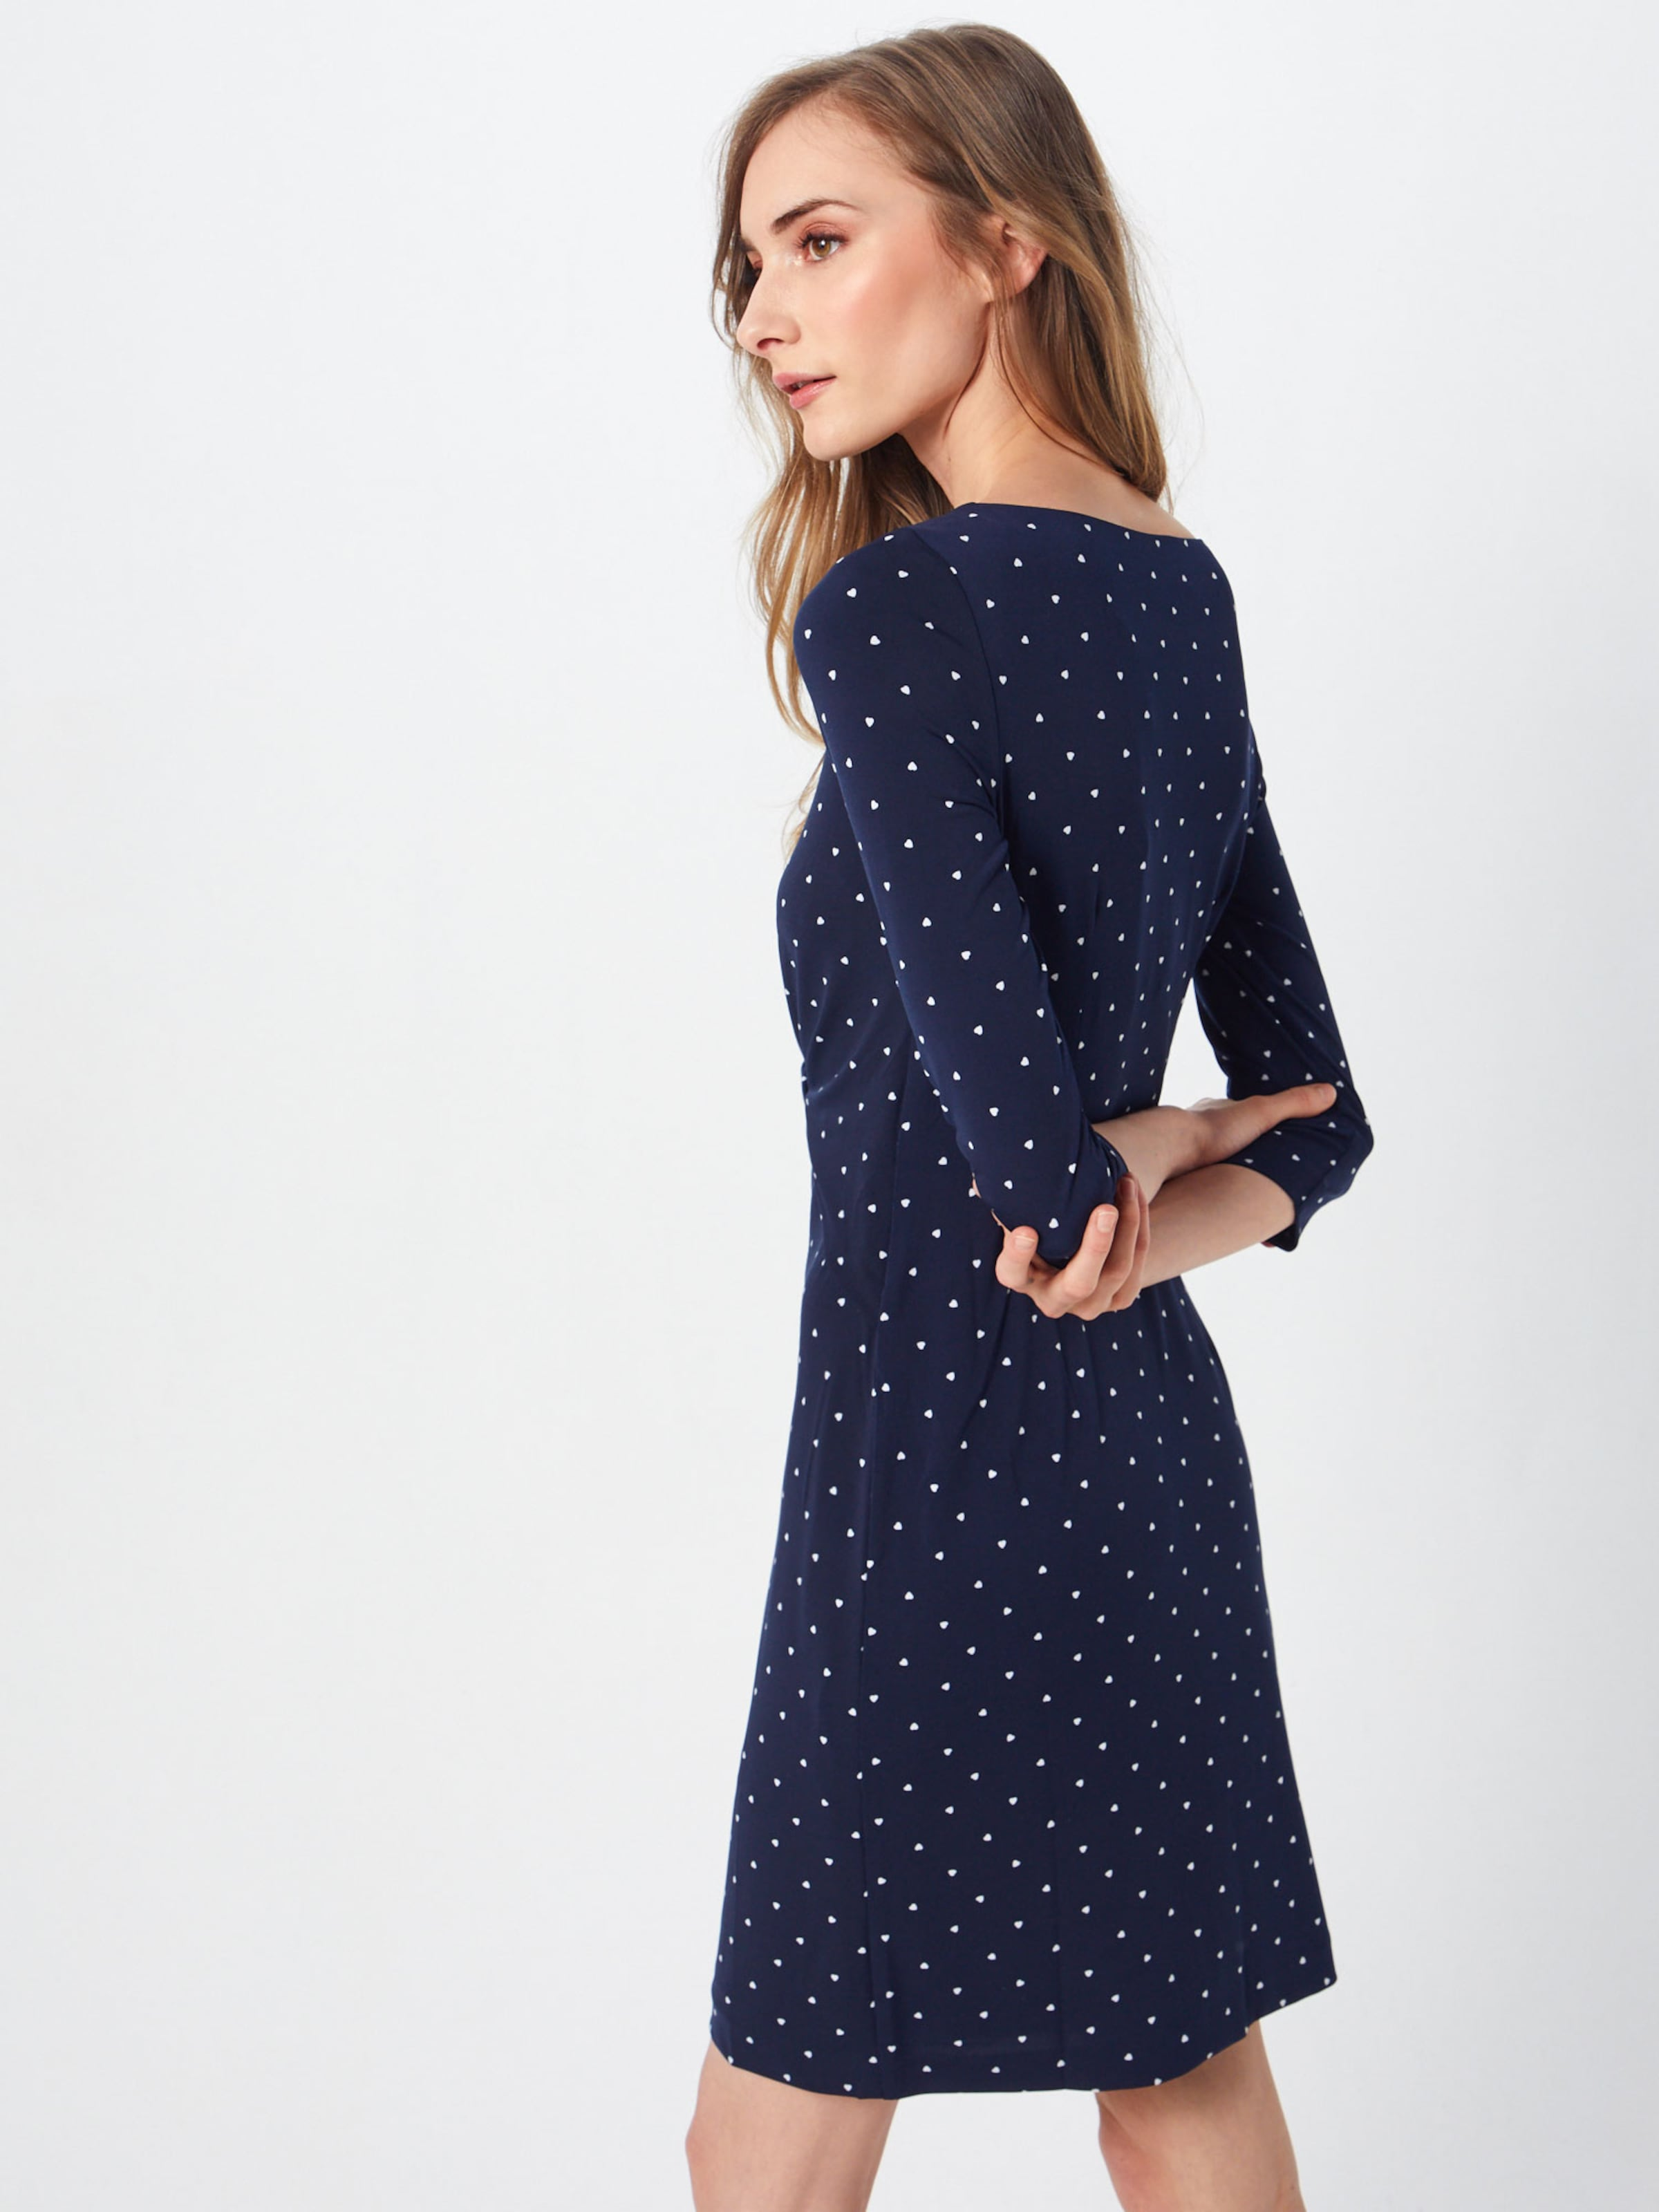 Kleid S 'knoten' Label DunkelblauWeiß In oliver Black FJ3clK1T